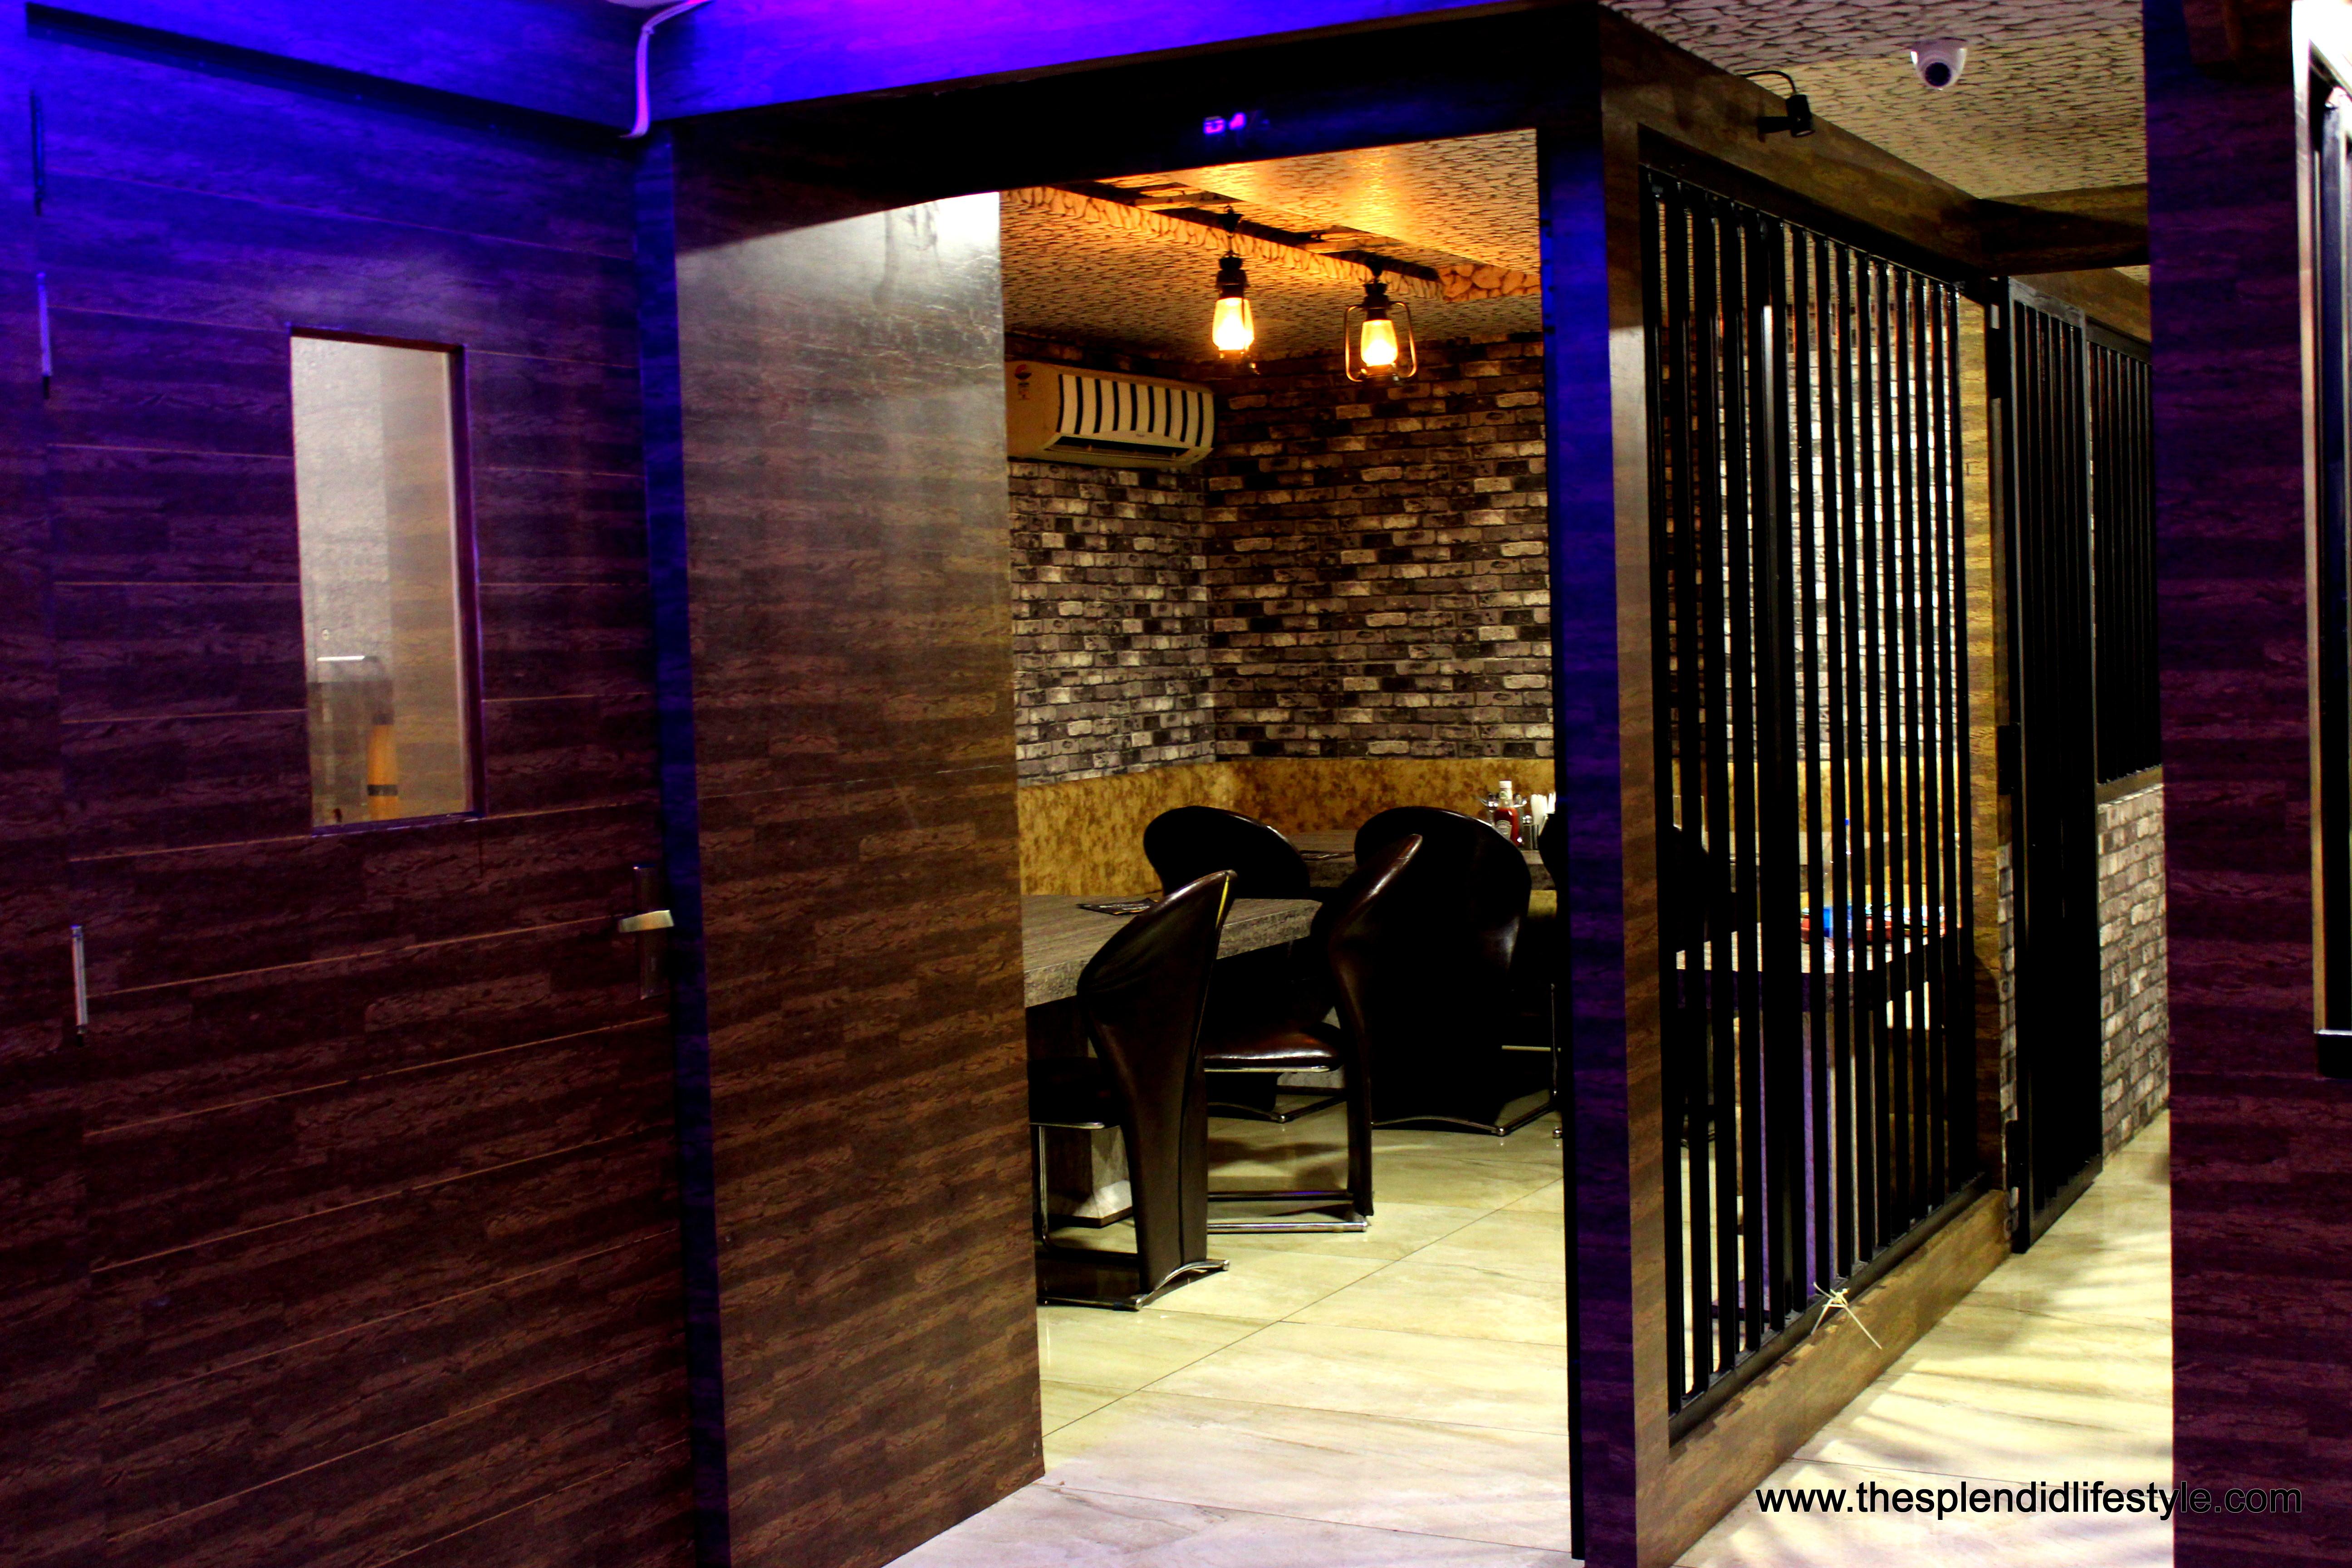 barracks-restaurant-and-lounge-jail-themed-restaurant-in-kanpur